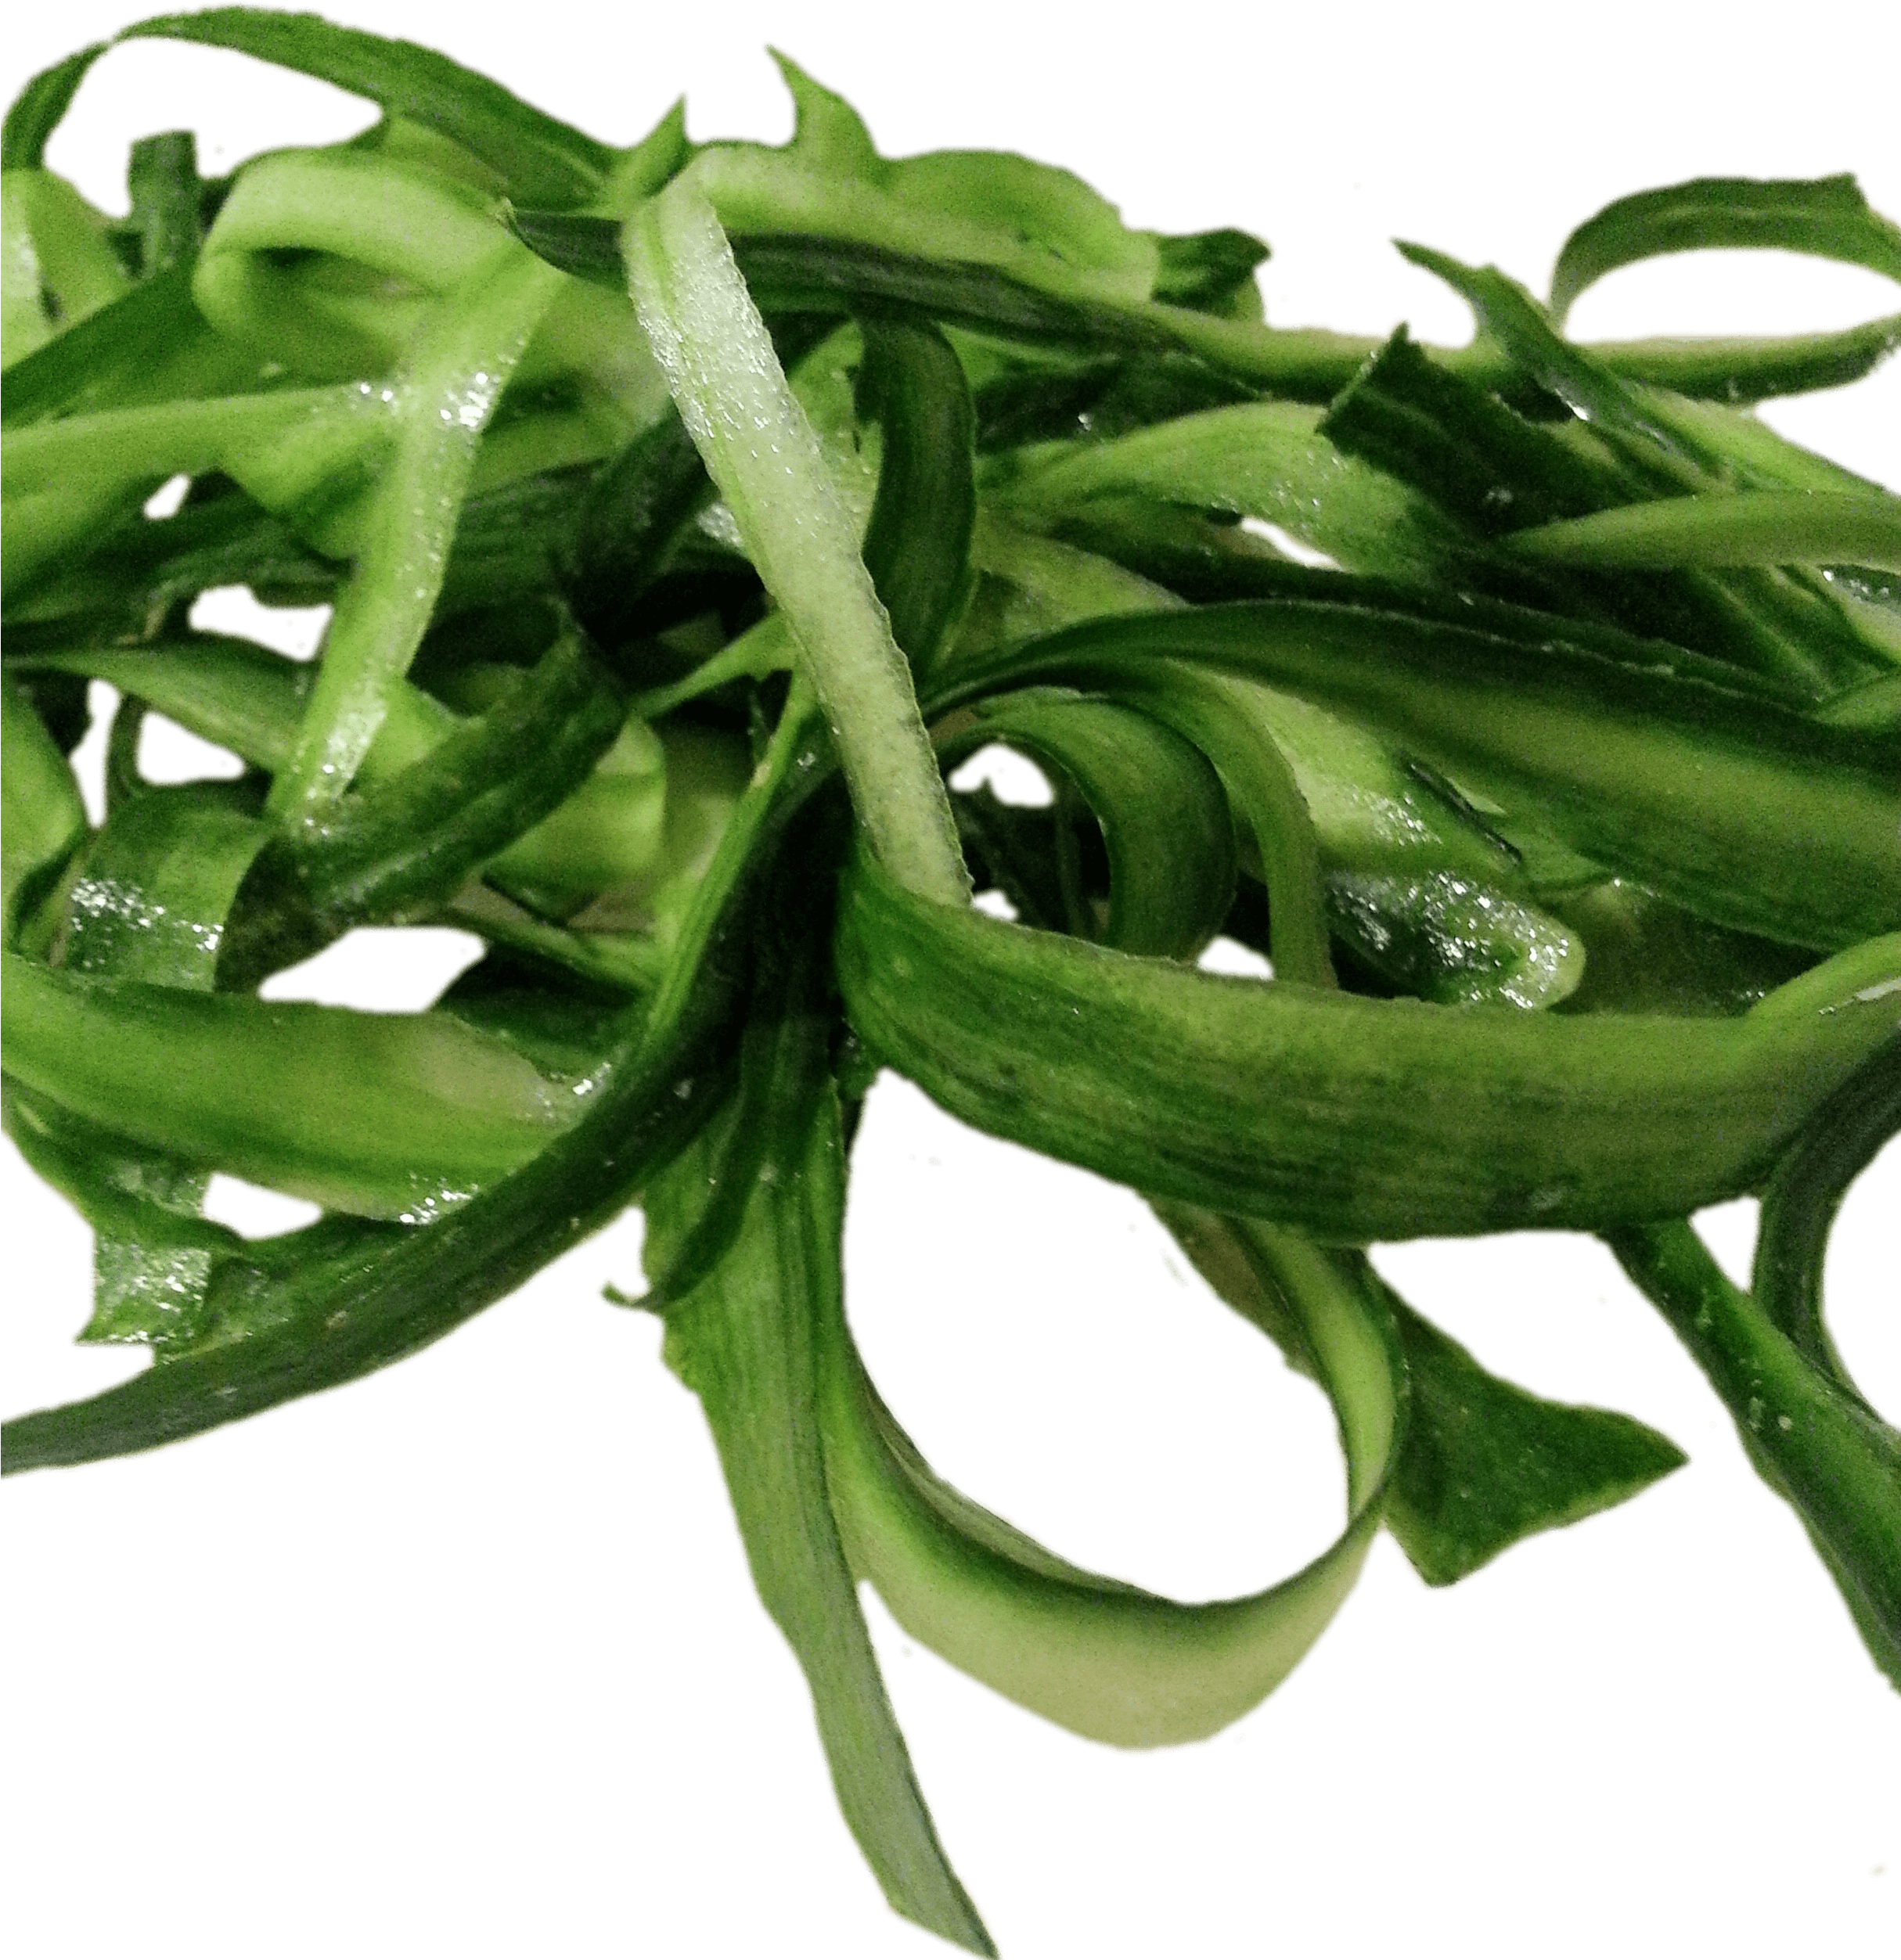 Cucumber Peels - Cucumber Peel (2428x2601), Png Download